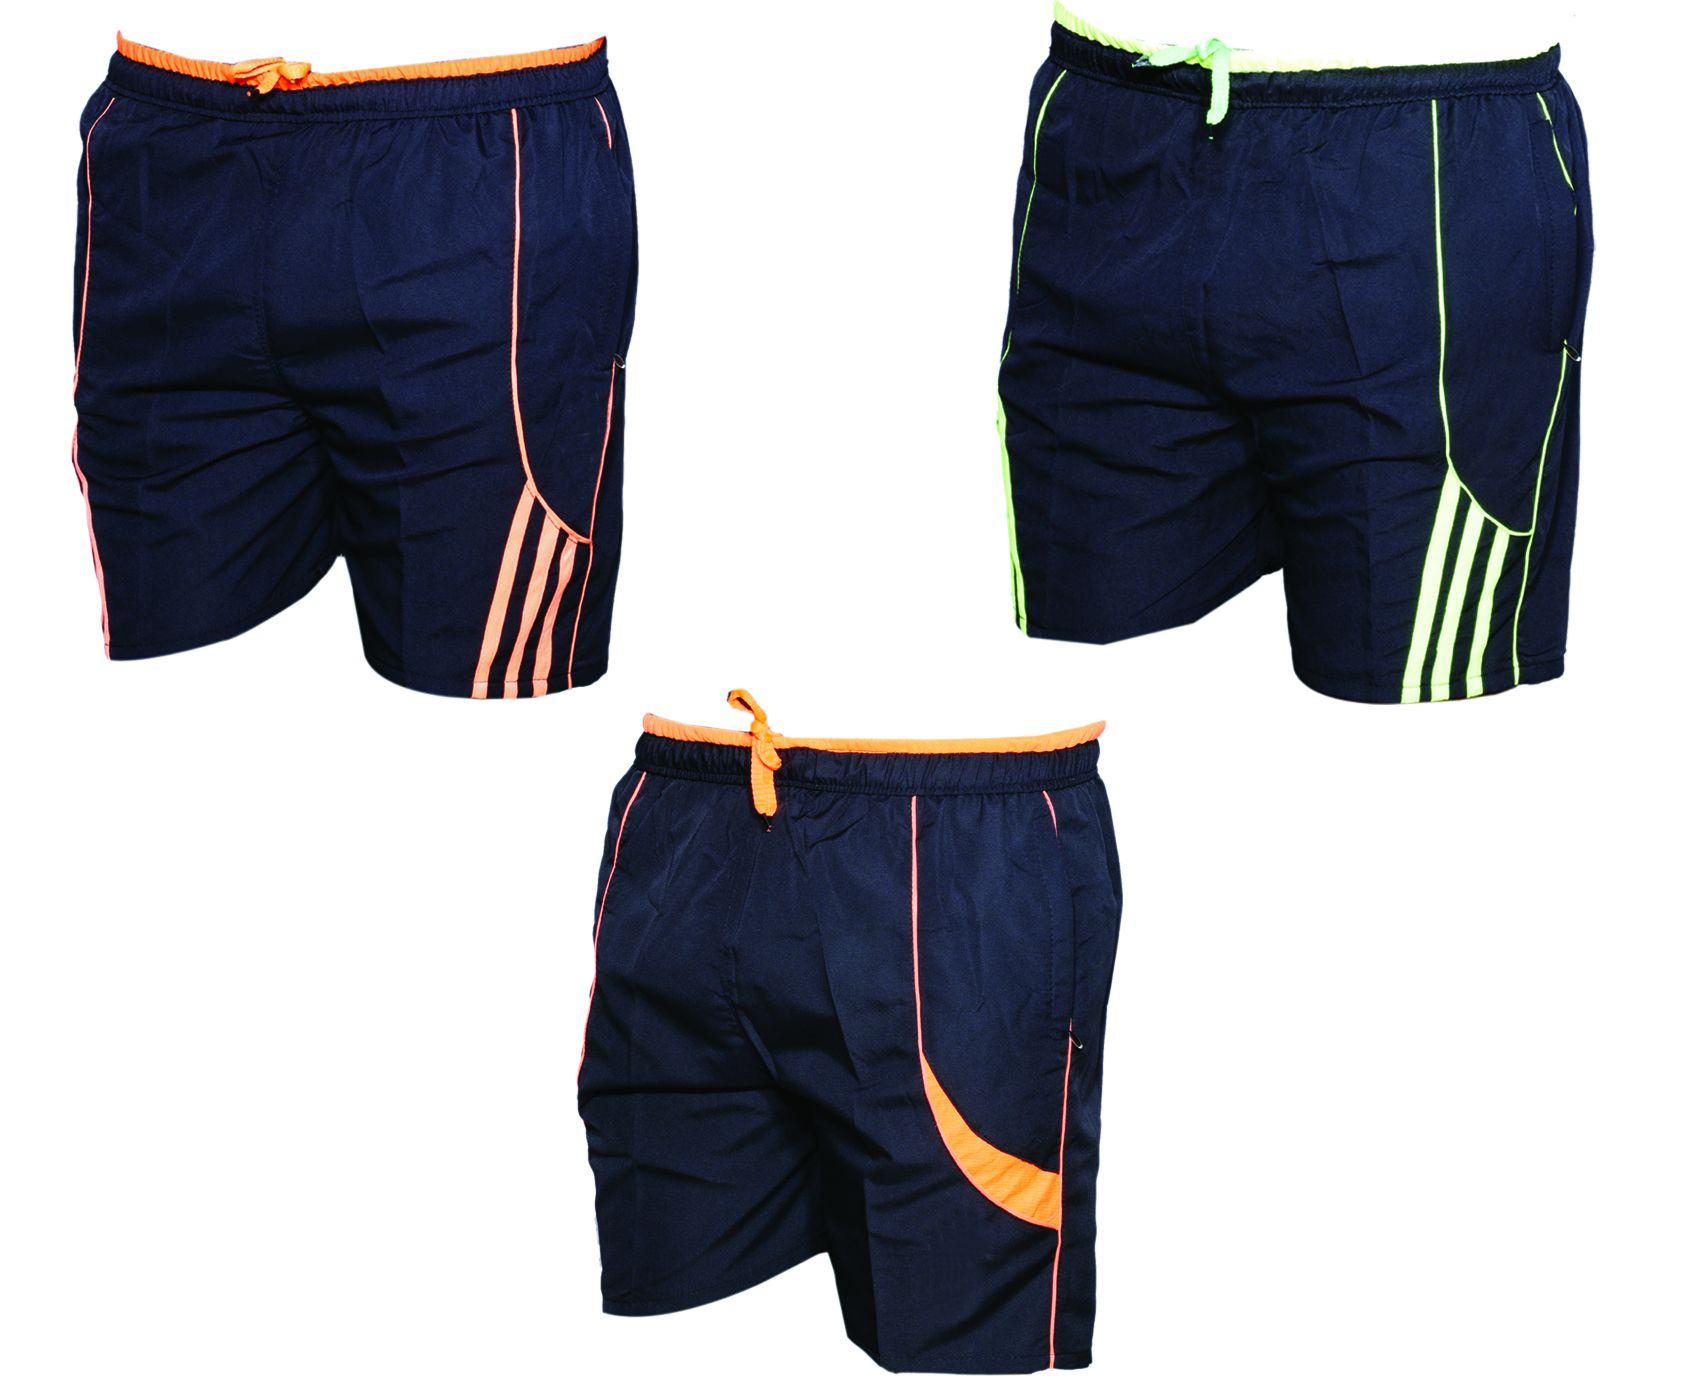 IndiWeaves Multi Shorts (Pack  of 3 Polyester Bermuda)